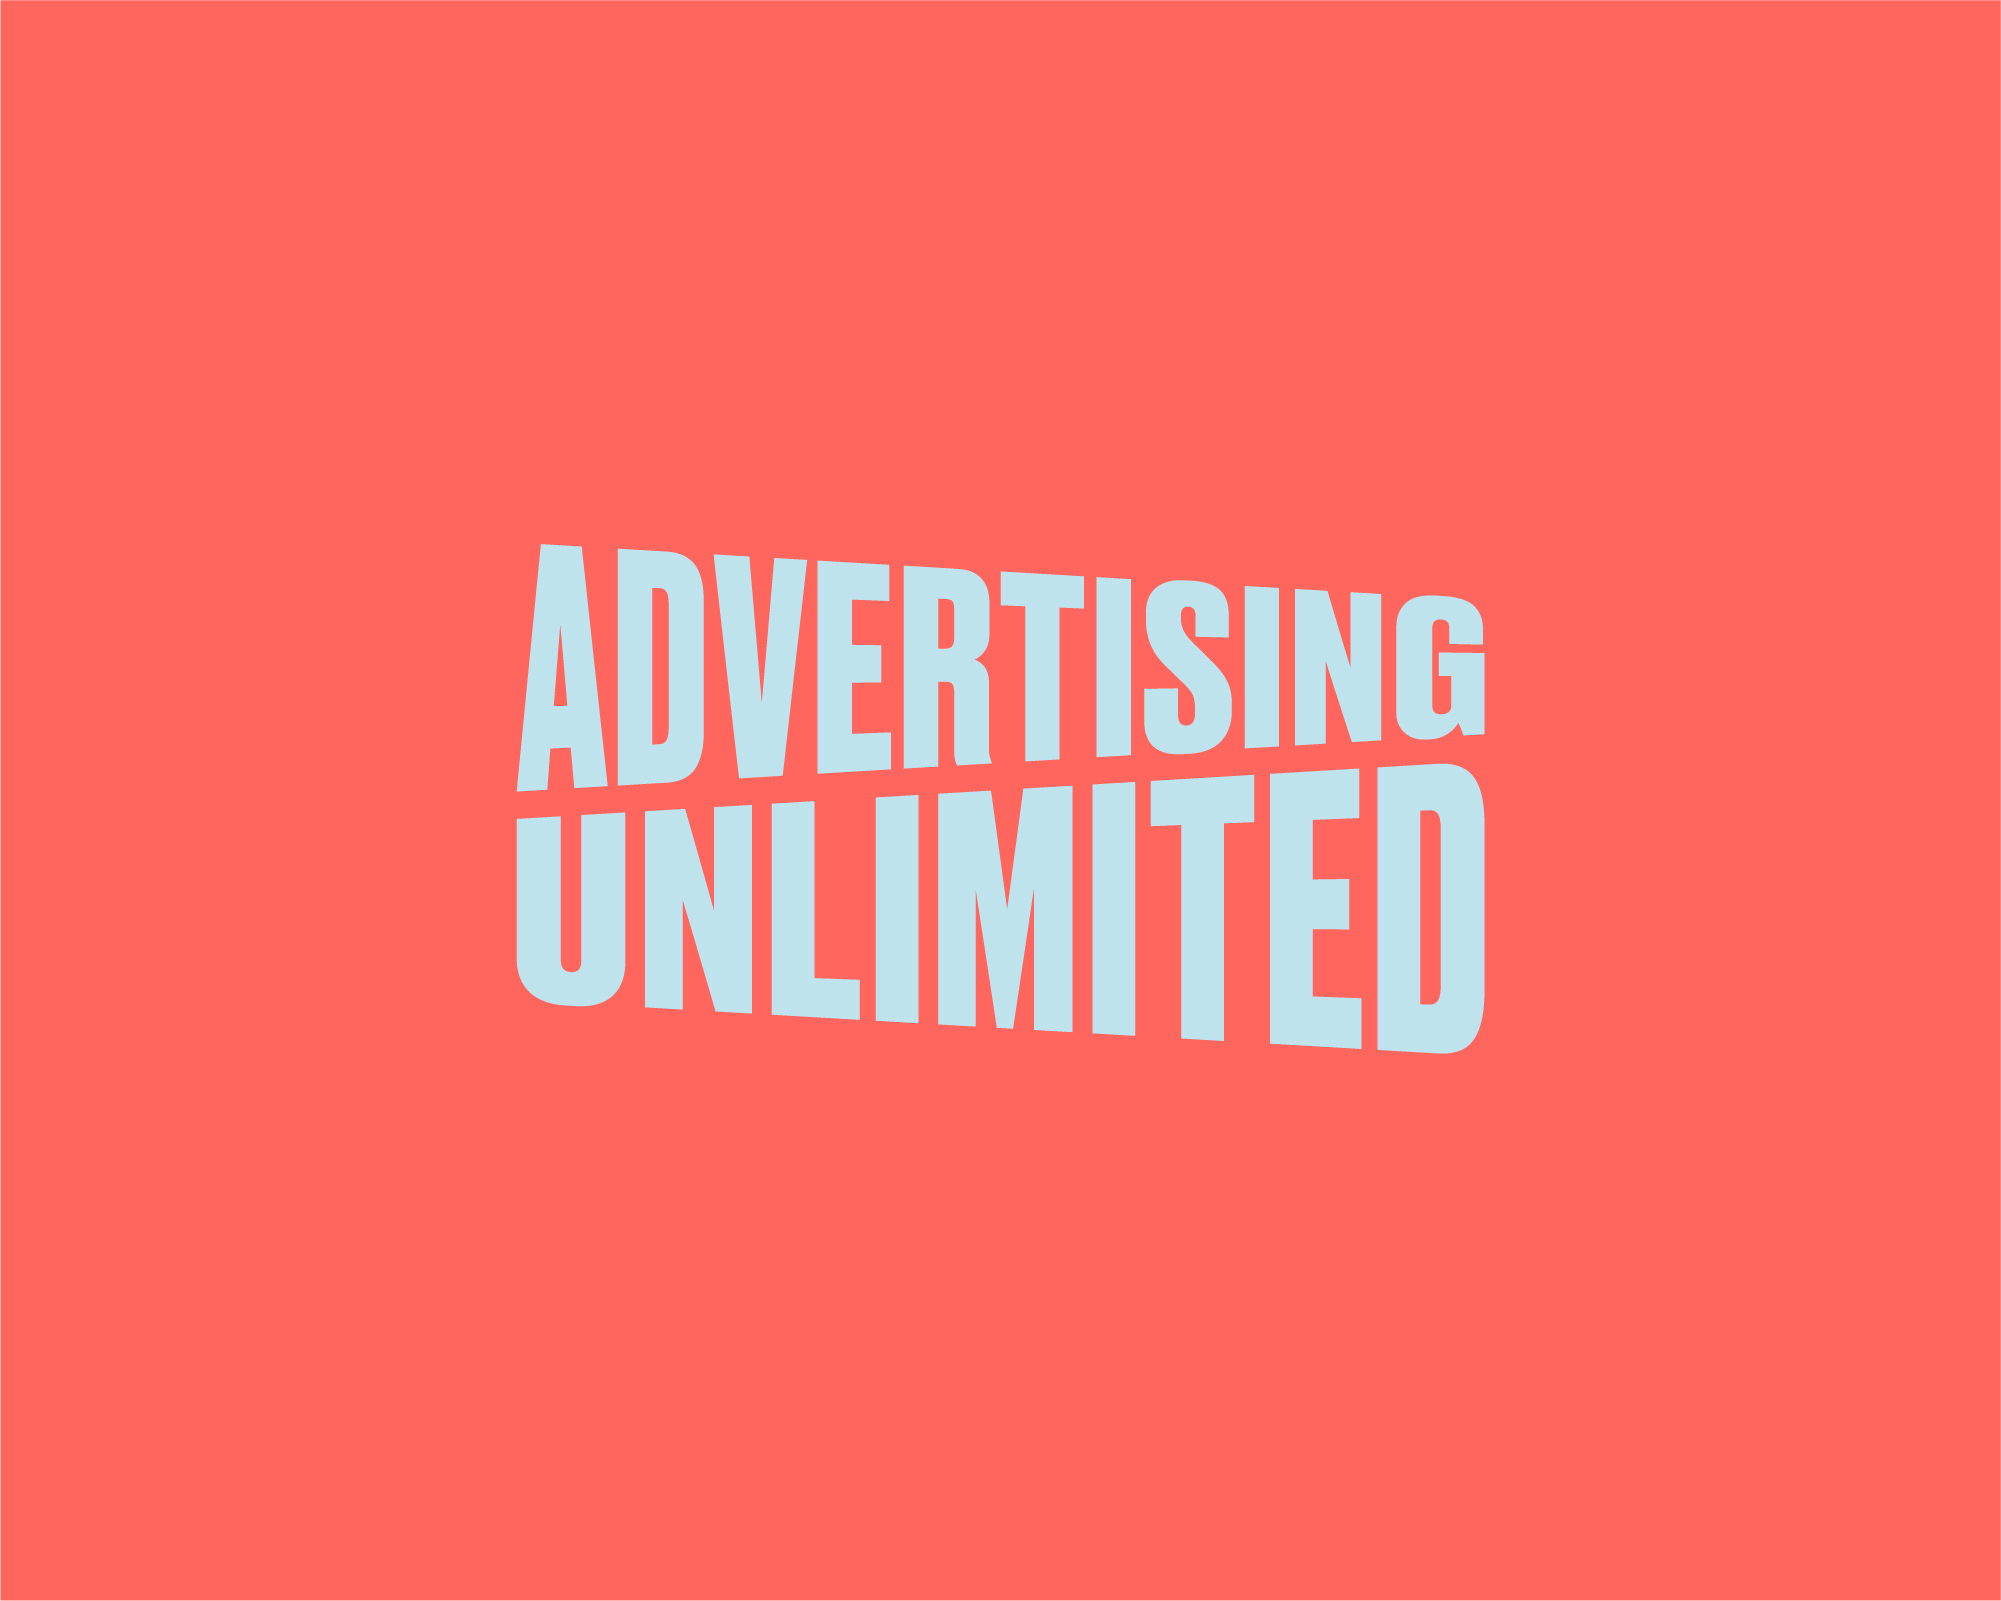 advertising_unlimited1.jpg